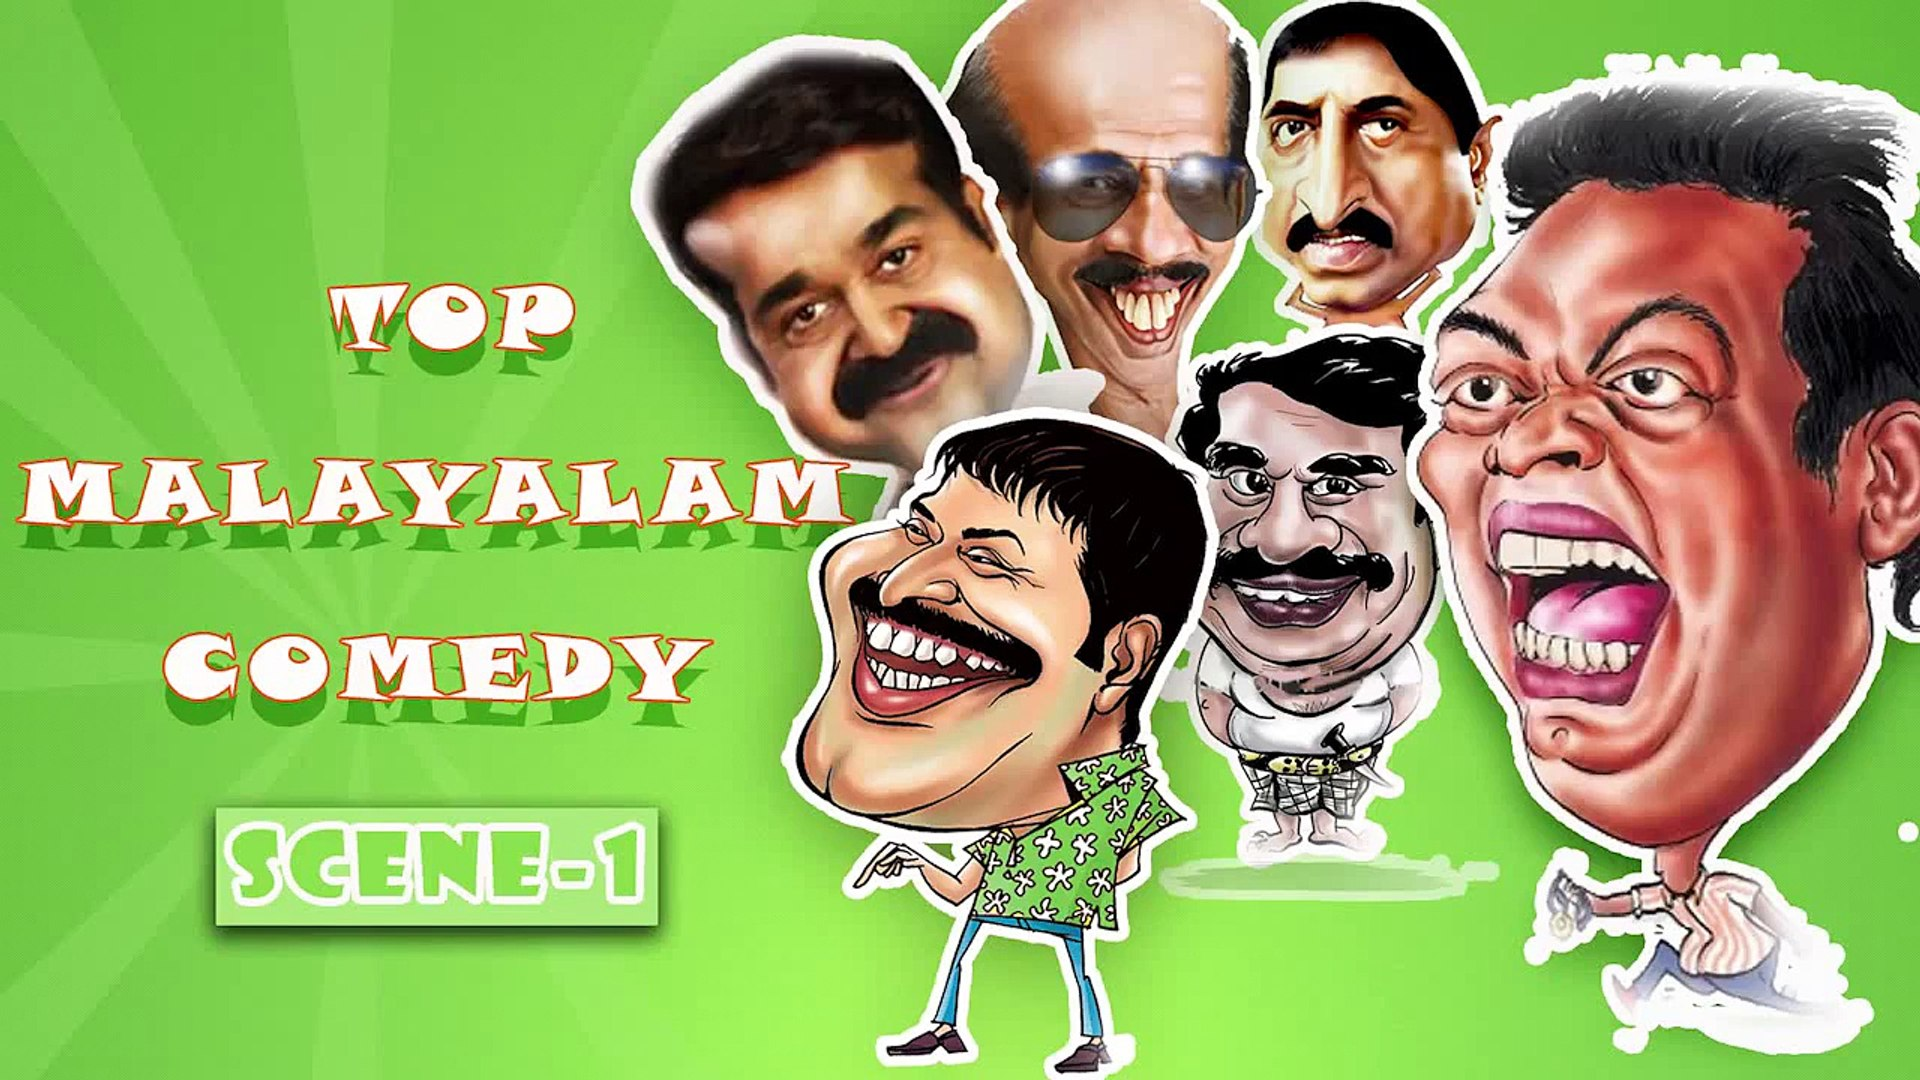 Malayalam Movie Top Comedy Scene 1 | Malayalam Comedy Scenes | Malayalam Movie Comedy Scen